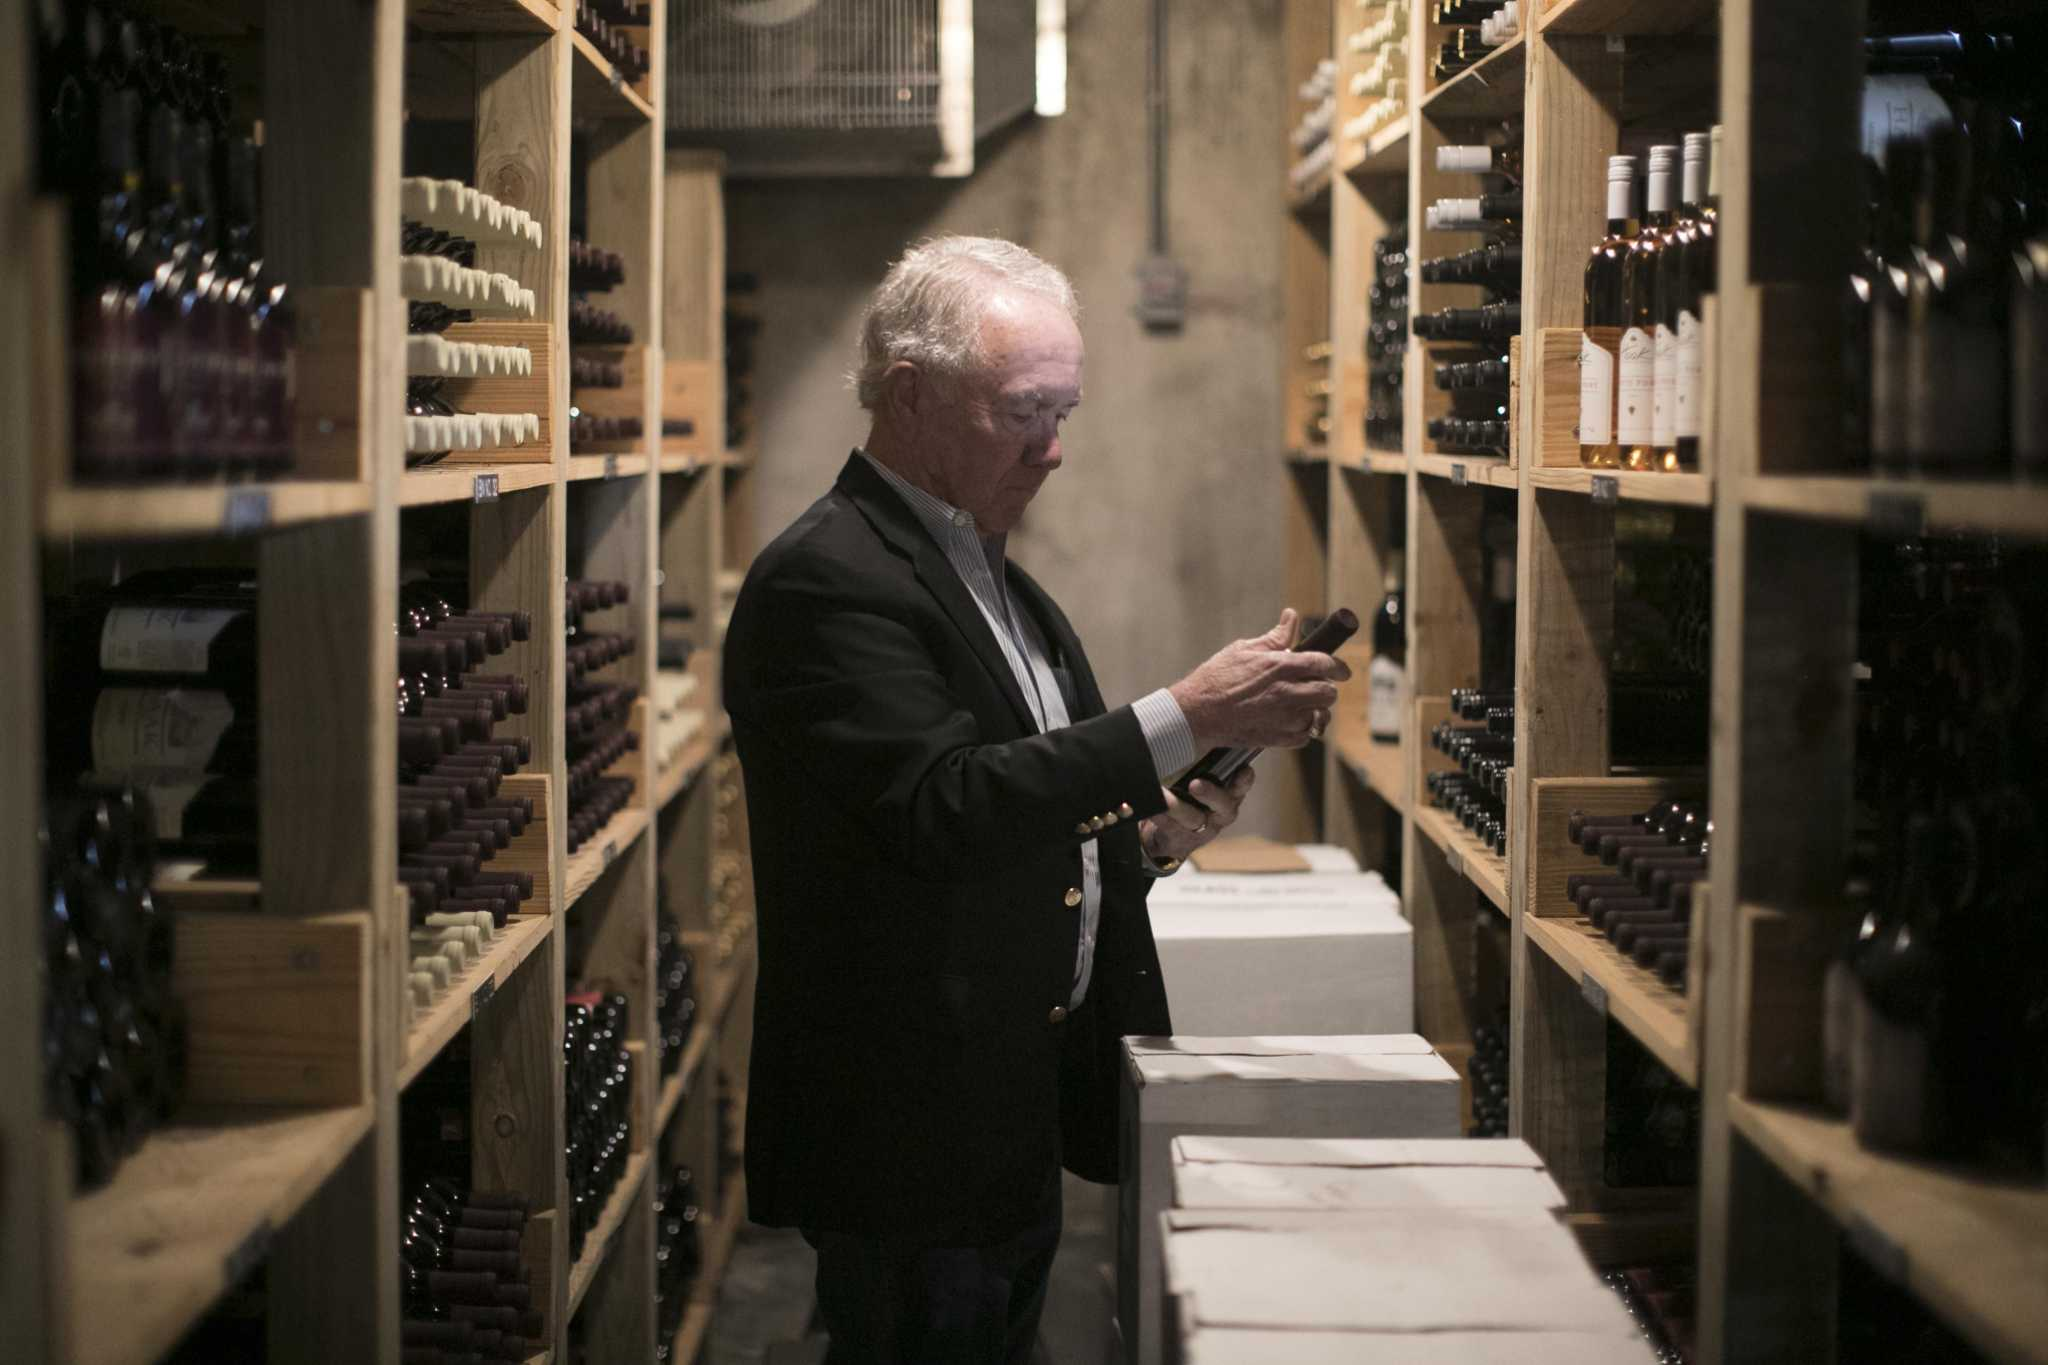 Haak Vineyards in Santa Fe turning heads with award-winning wines